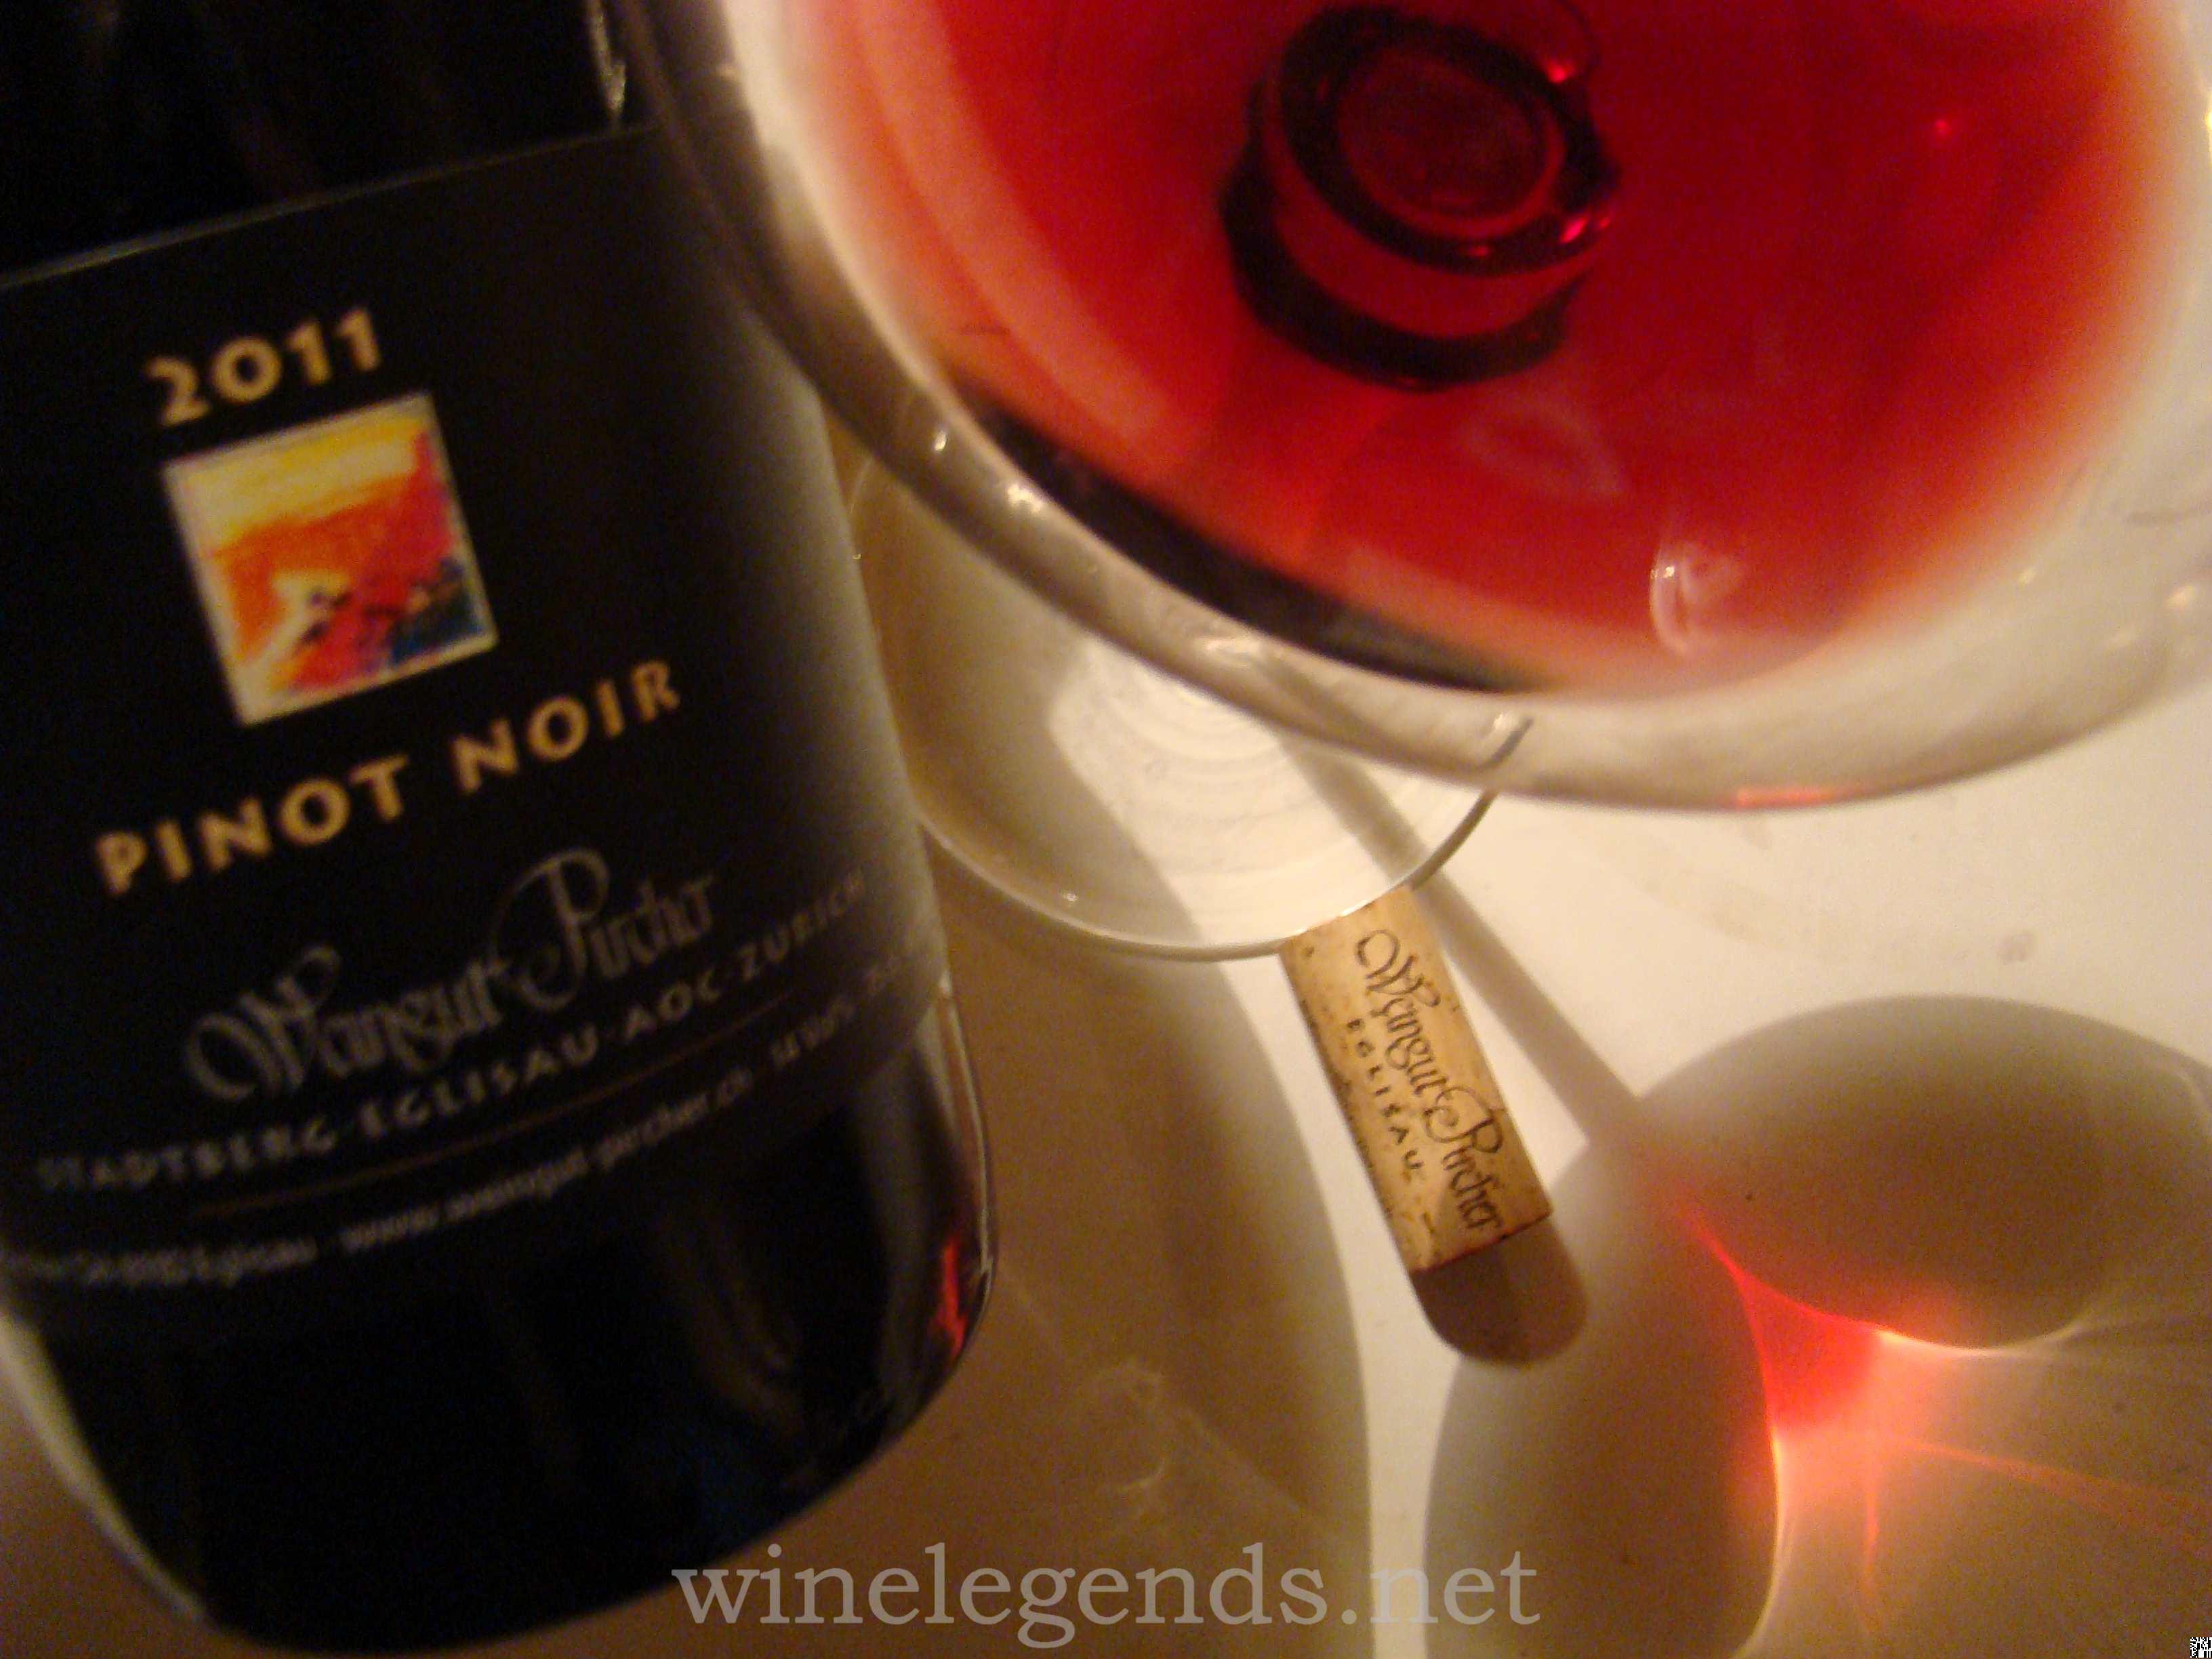 wine tasting journal template - weingut pircher pinot noir 2011 wine and lifestyle